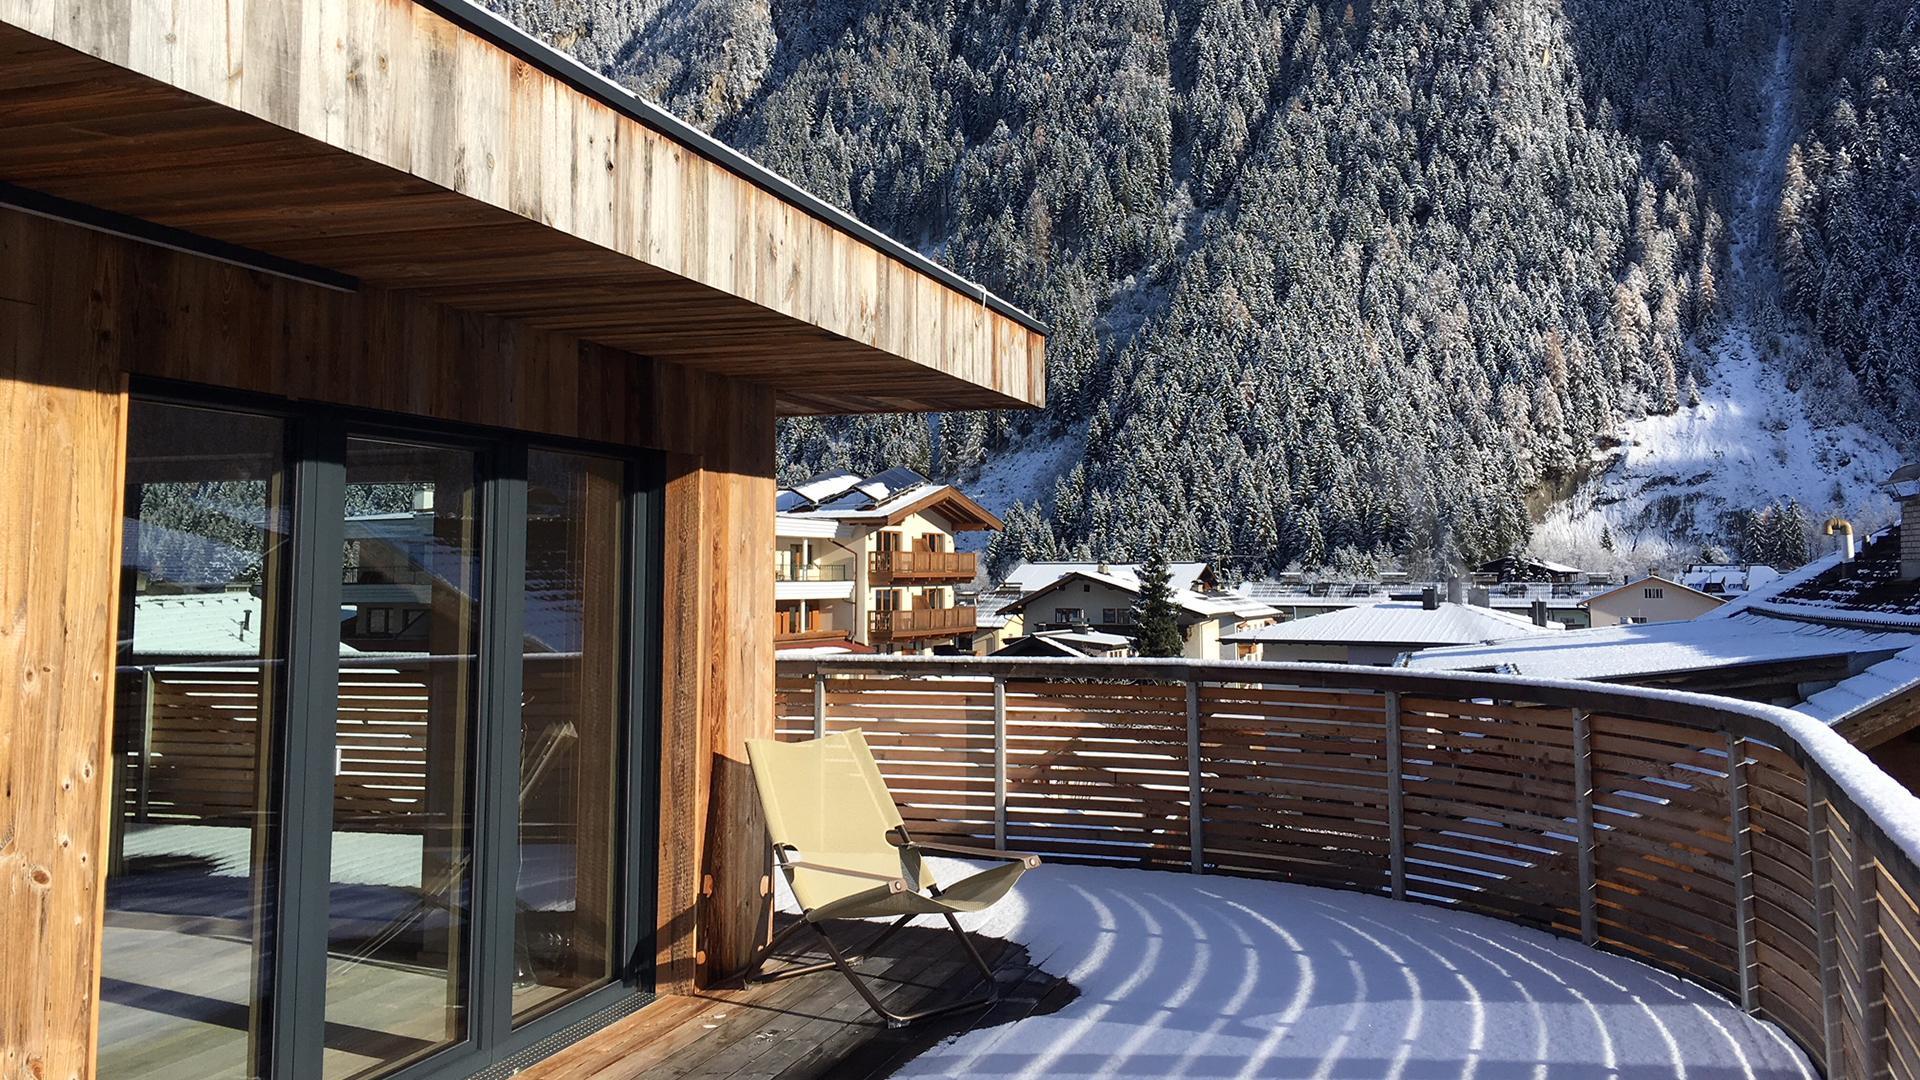 The Twilight Penthouse Apartments, Austria